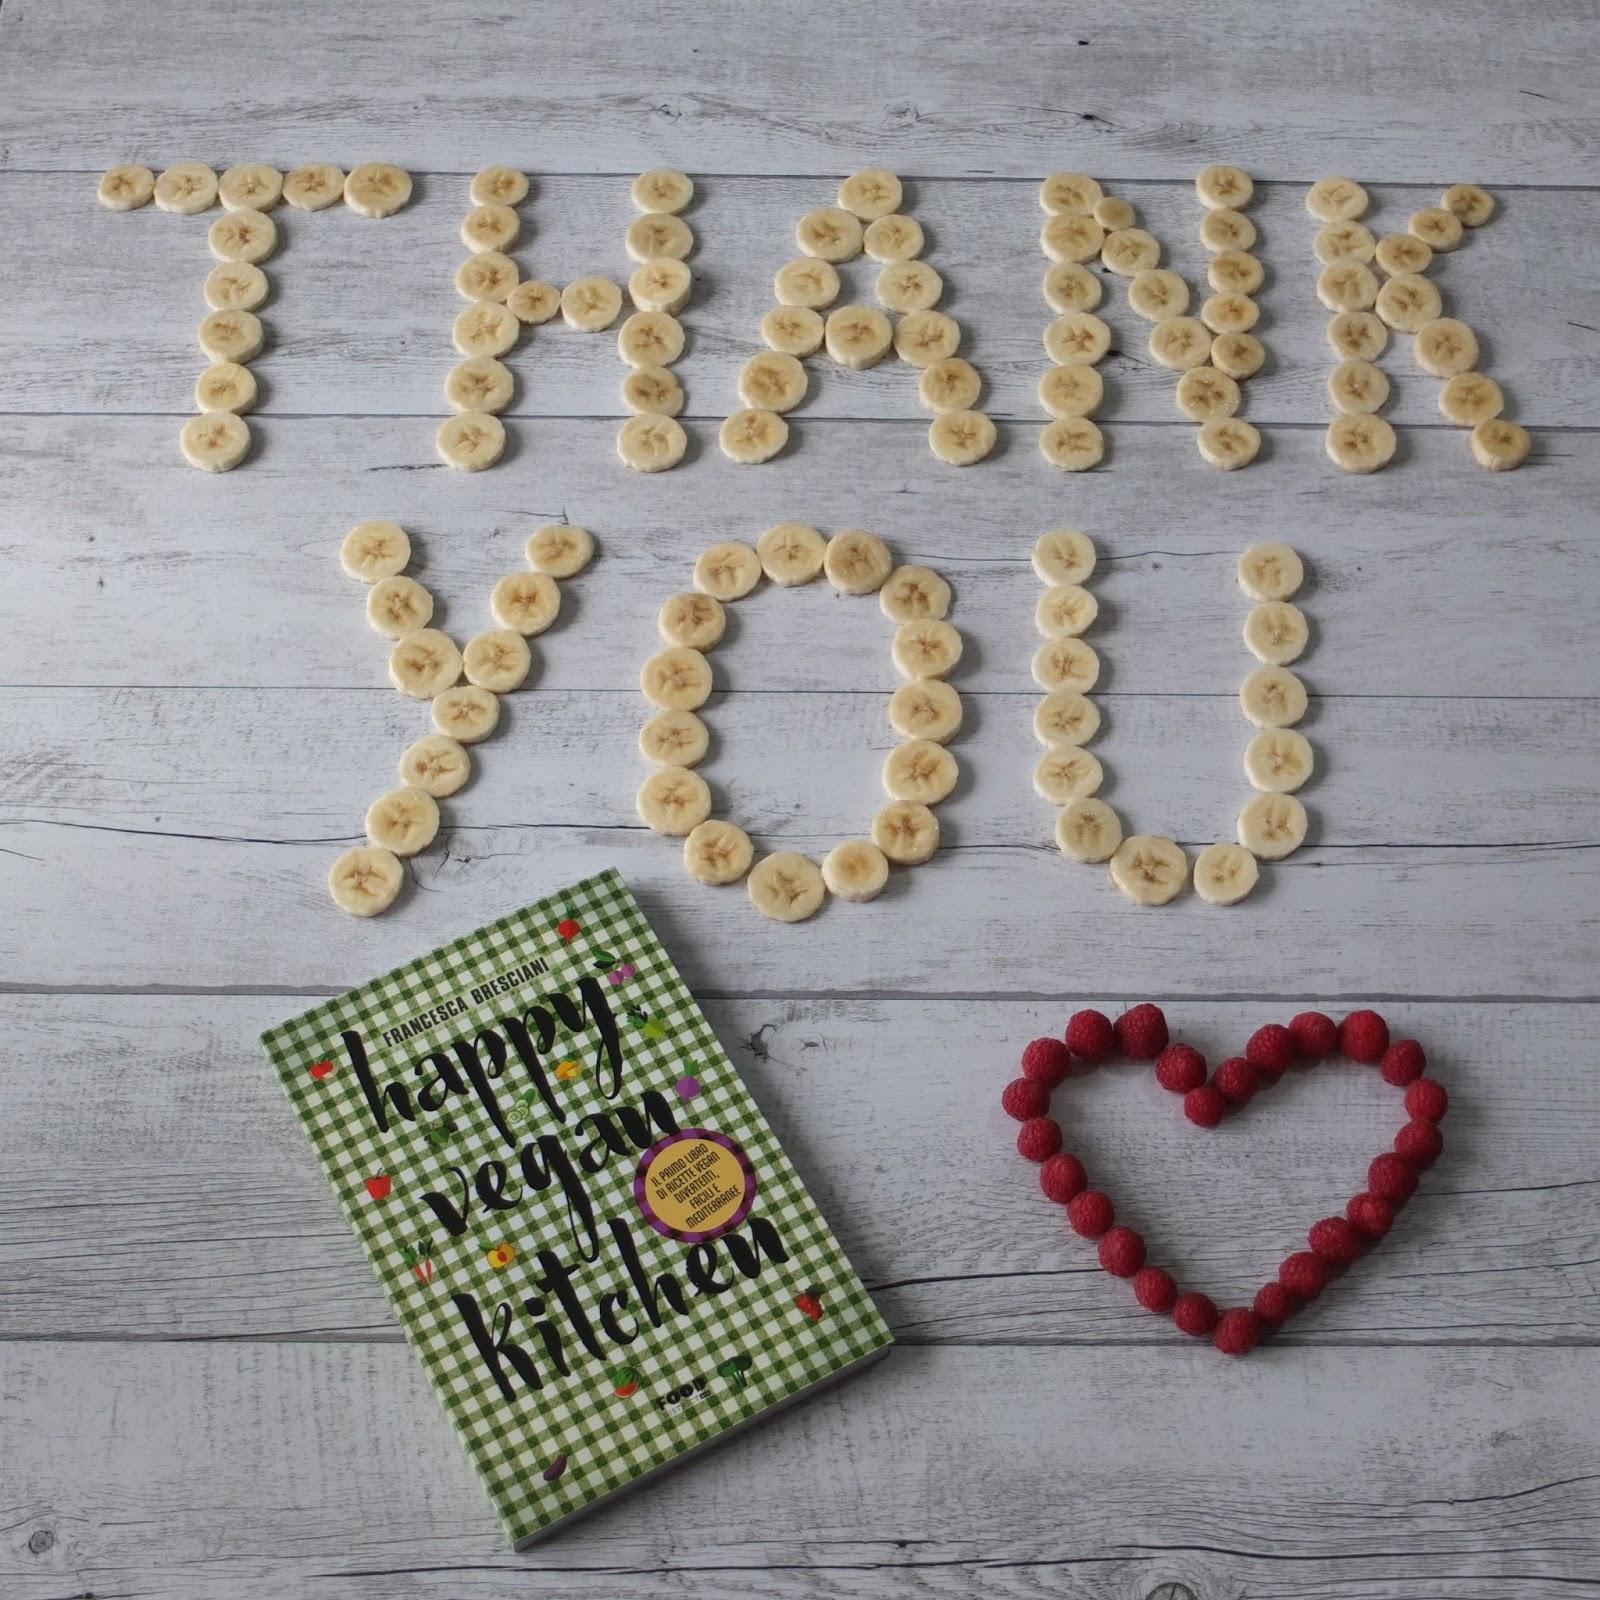 briciole di cesca*qb ?*´¨`*?.¸¸.?*´(happyvegankitchen)`*?.¸¸.?*´¨`*? - Libri Cucina Vegana